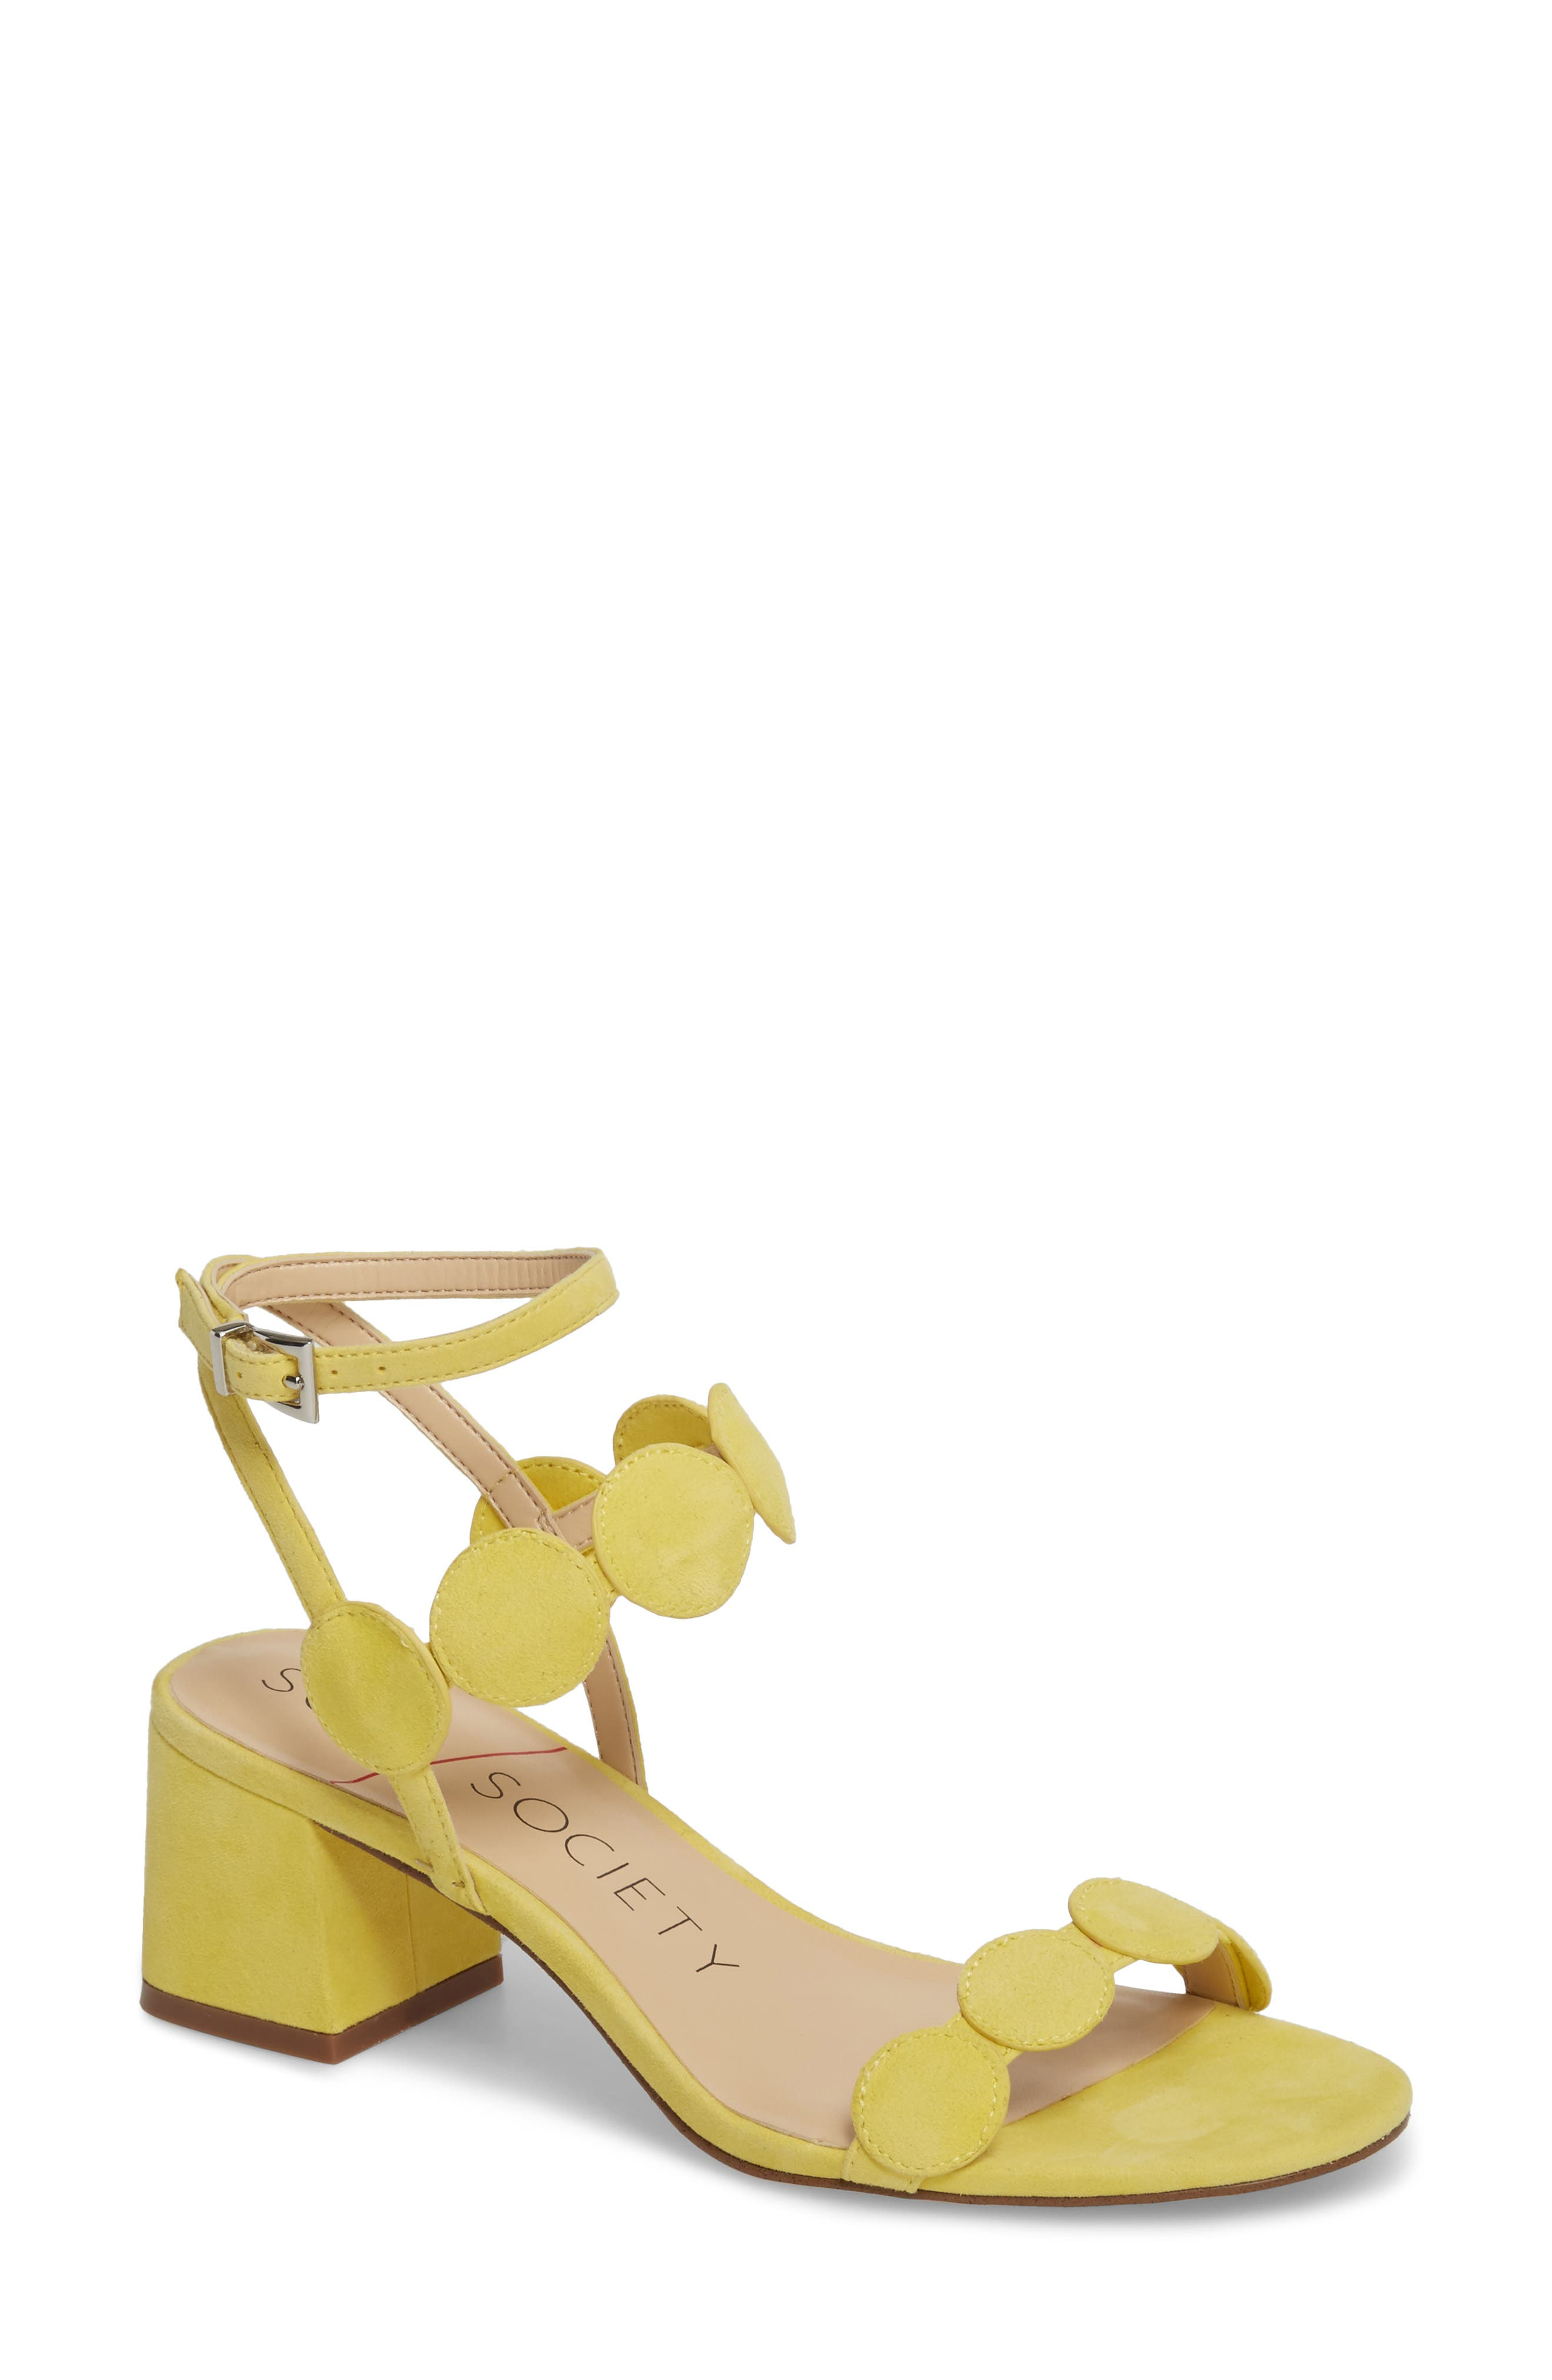 Alternate Image 1 Selected - Sole Society Shea Block Heel Sandal (Women)